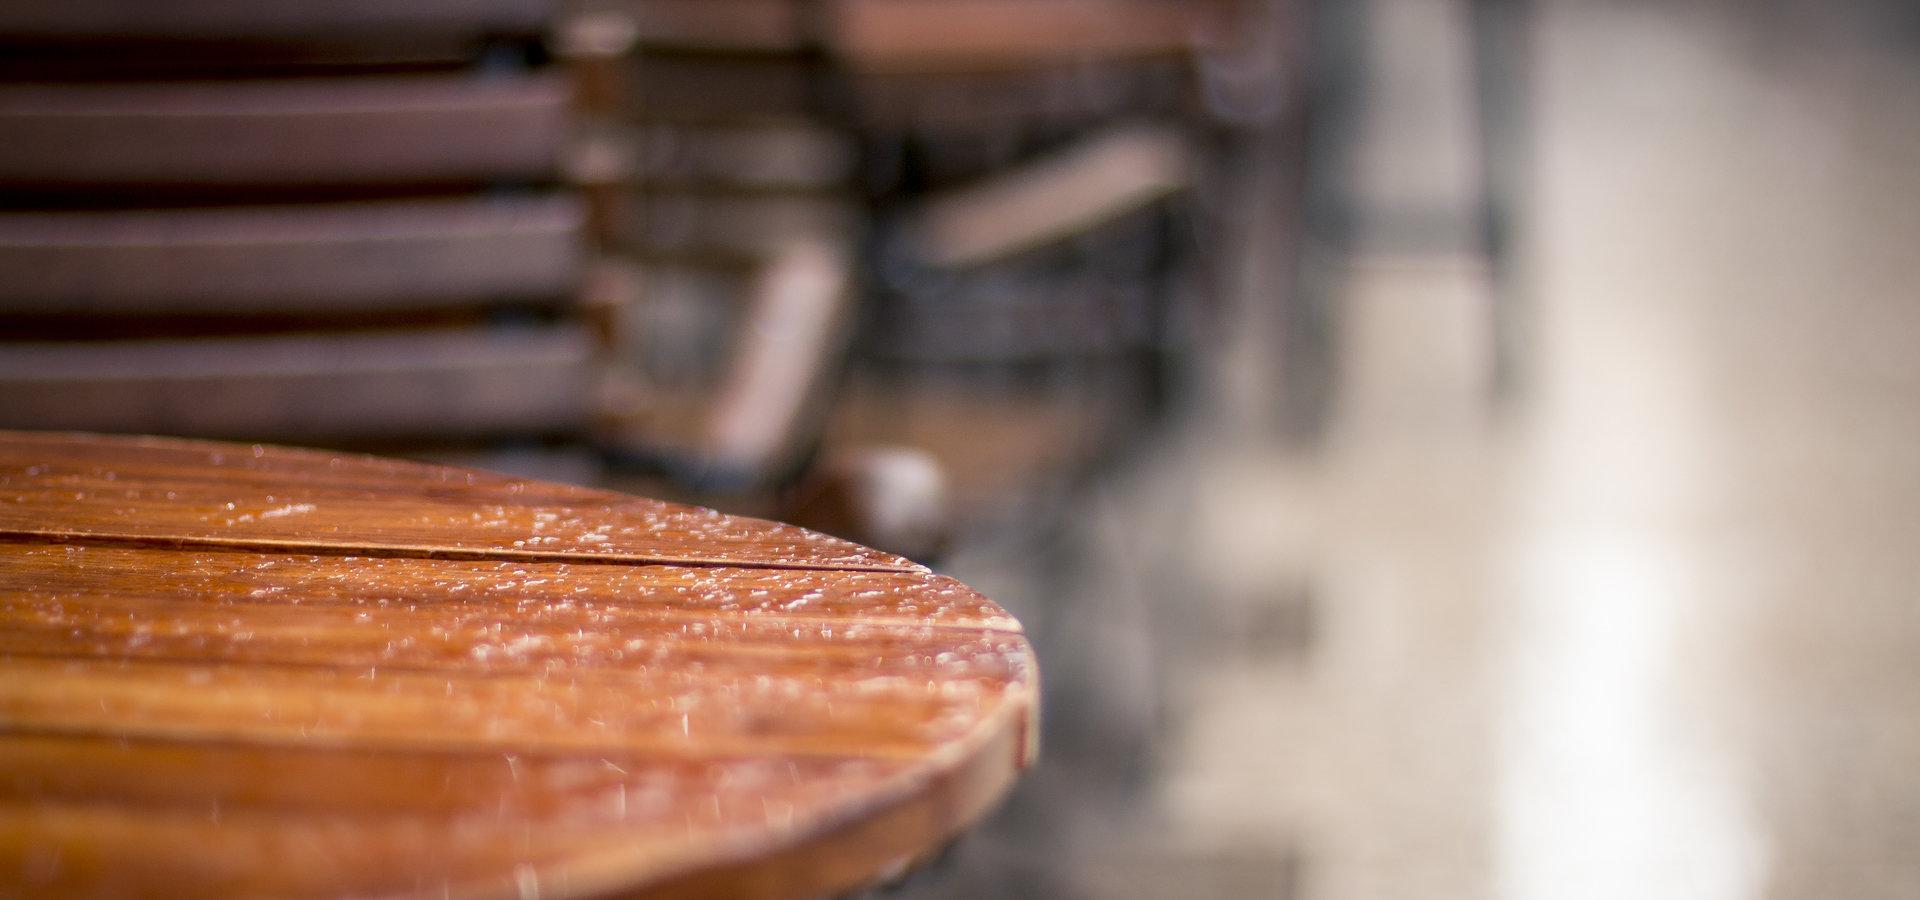 NRA zgadza się na okrągły stół branży aptecznej